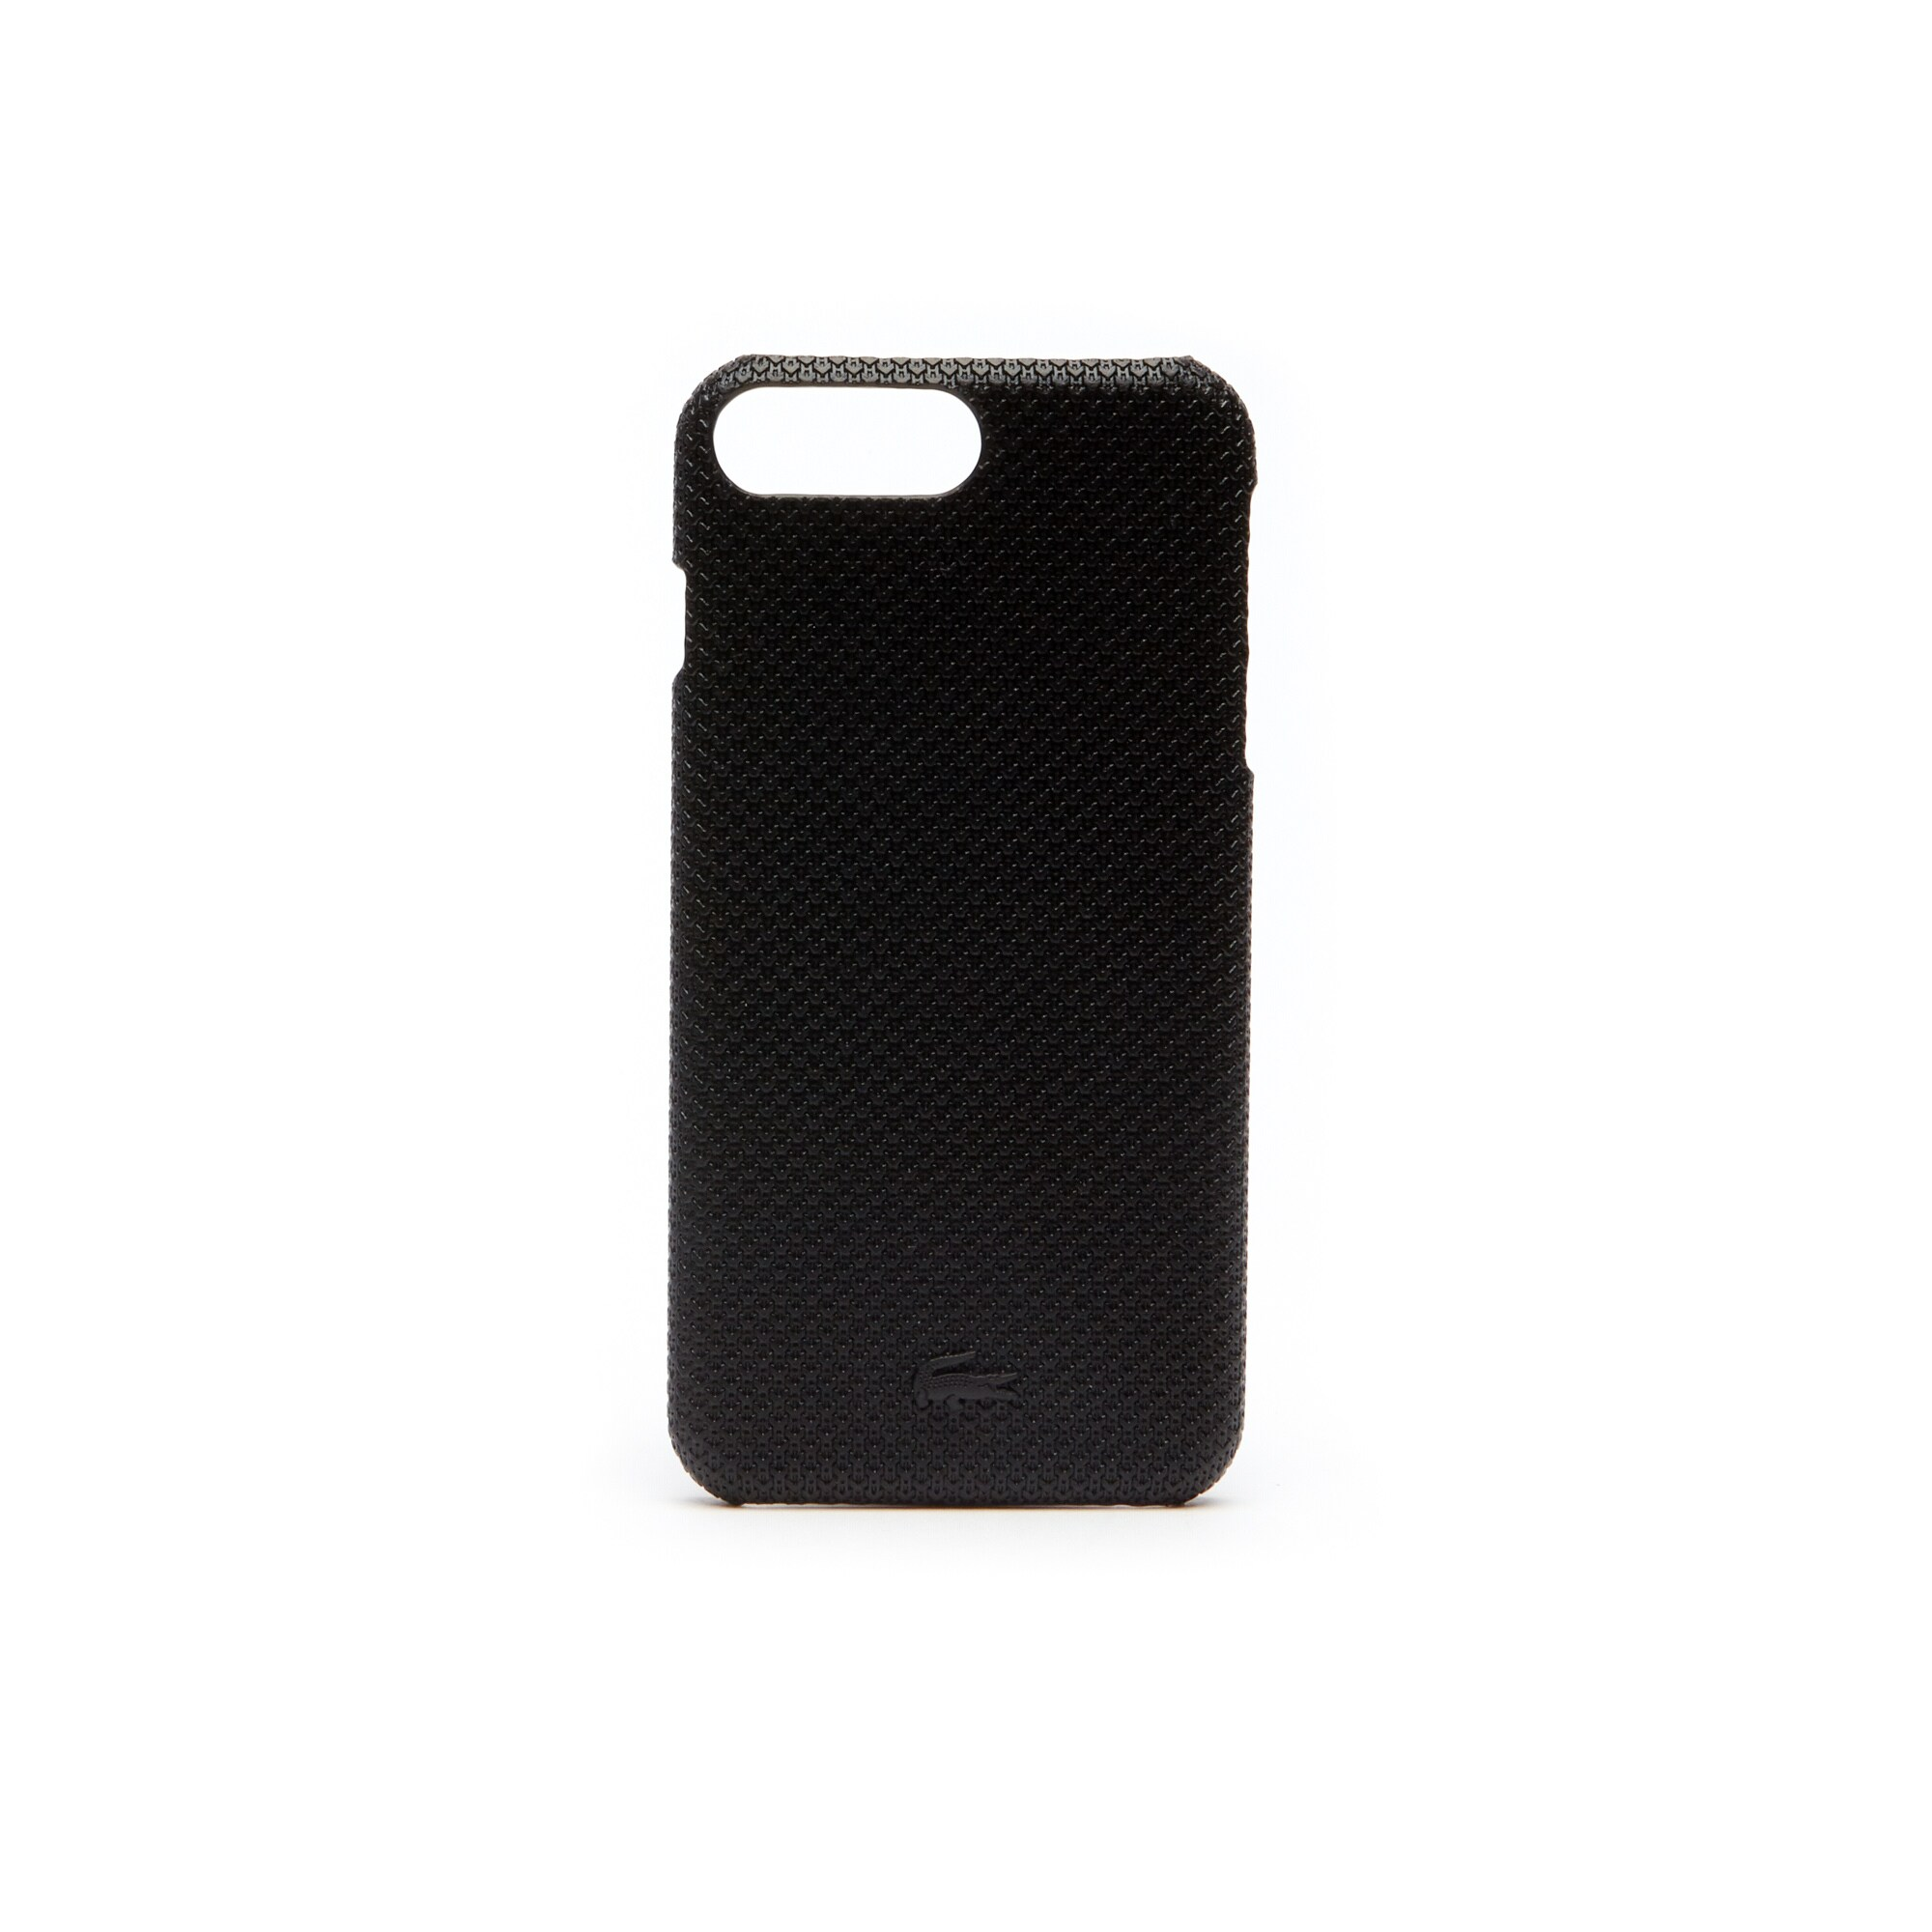 Custodia per iPhone 8+ in pelle piqué opaca Chantaco